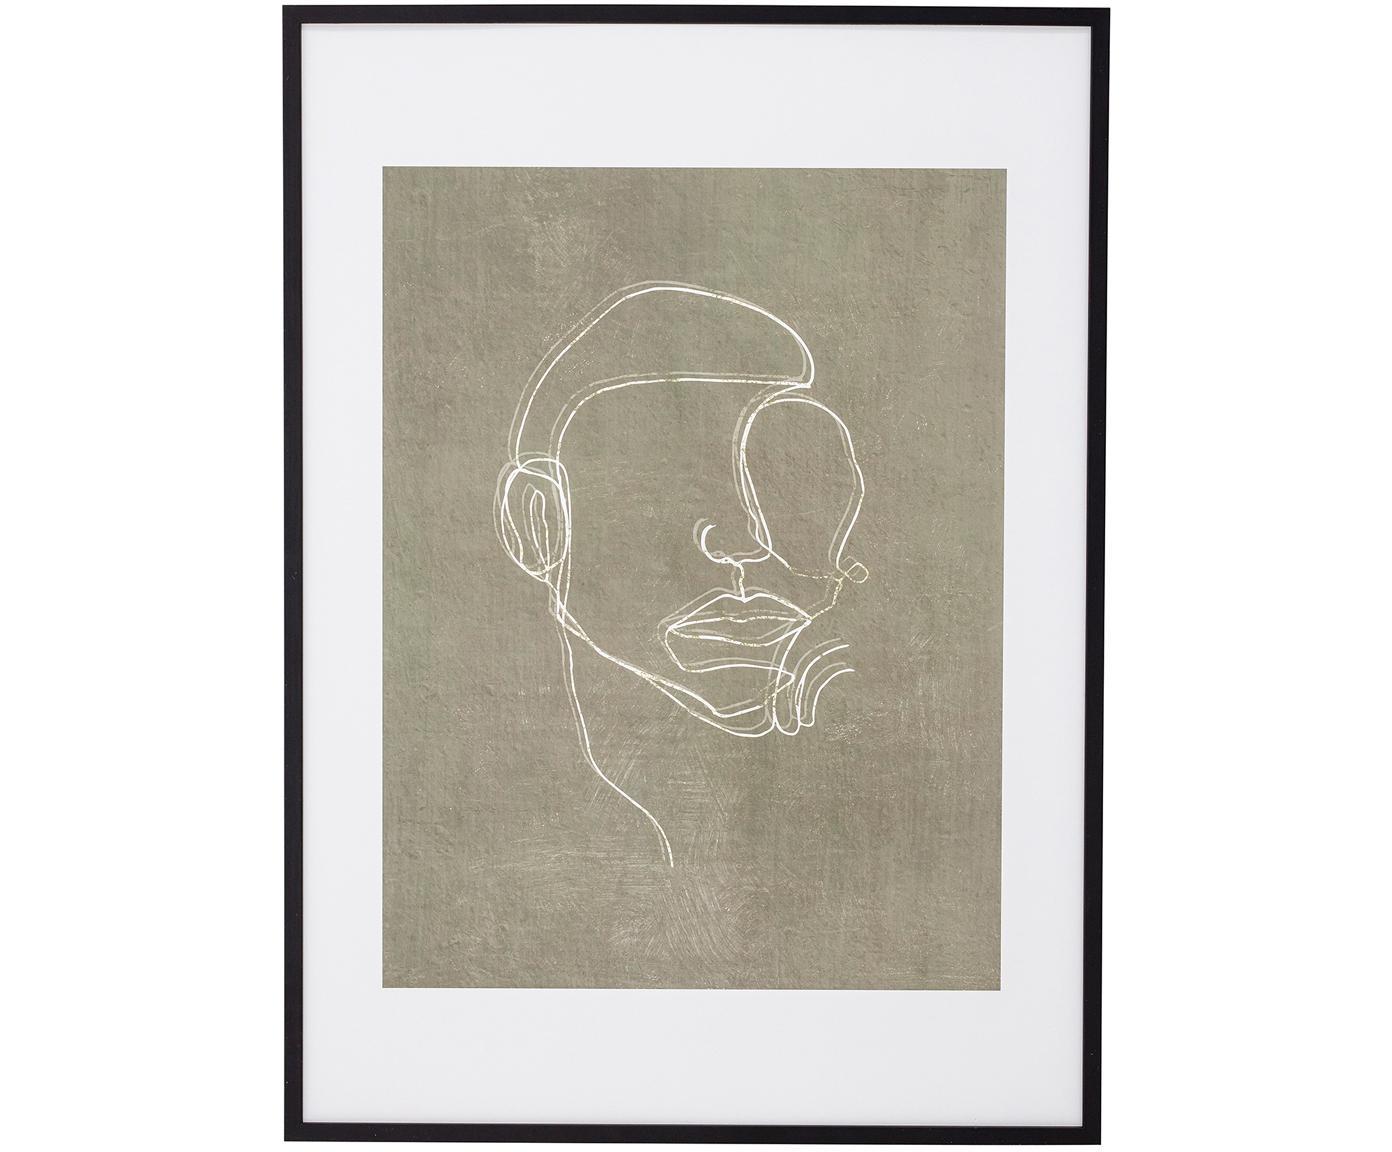 Ingelijste digitale print Espen, Lijst: hout, Zwart, greige, wit, 52 x 72 cm